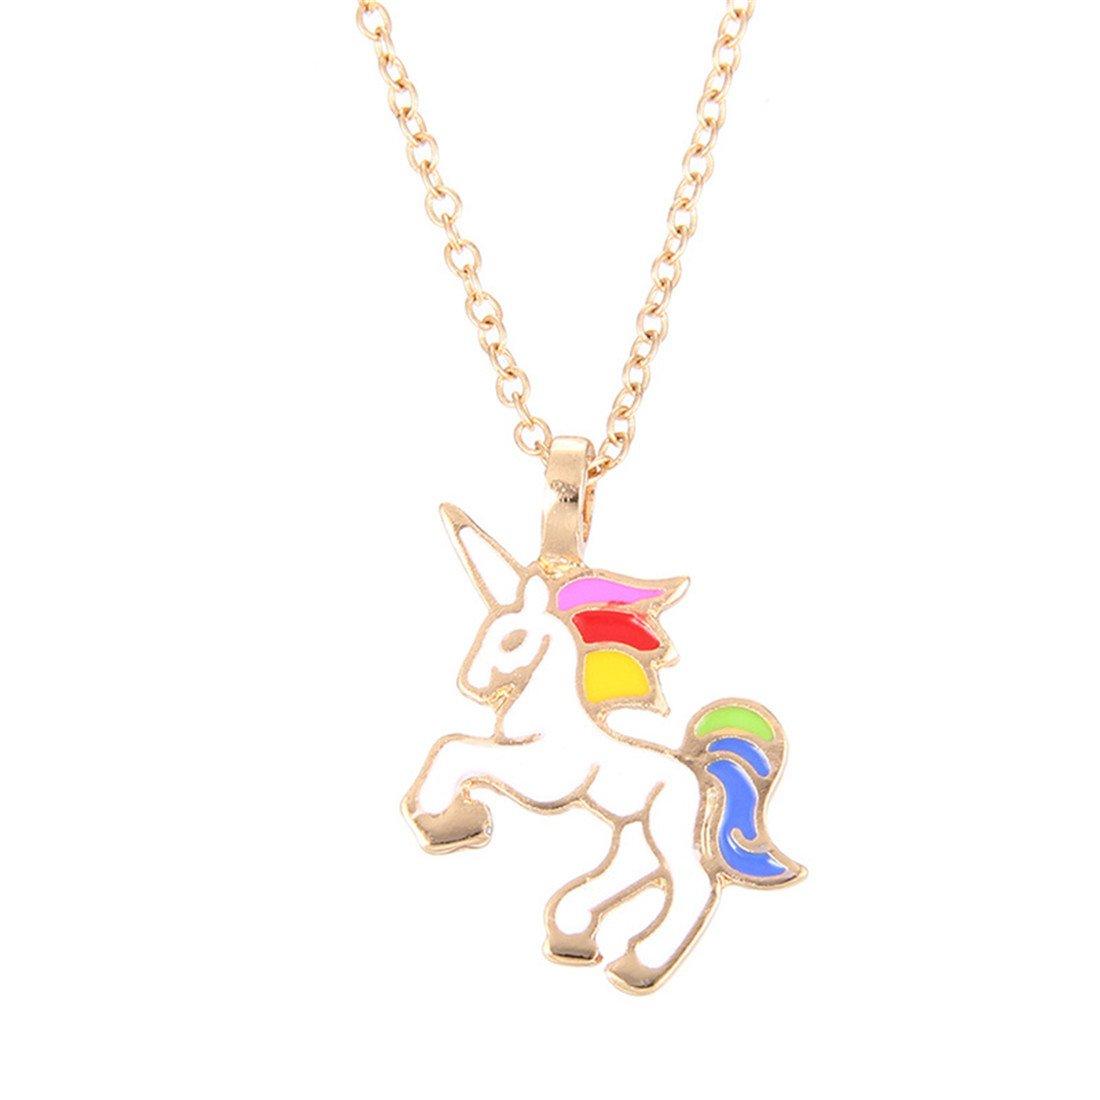 VWH 1 pcs Women Girls Alloy Necklace Unicorn Pendant Clavicle Bone Chain Necklace Jewelry Gift